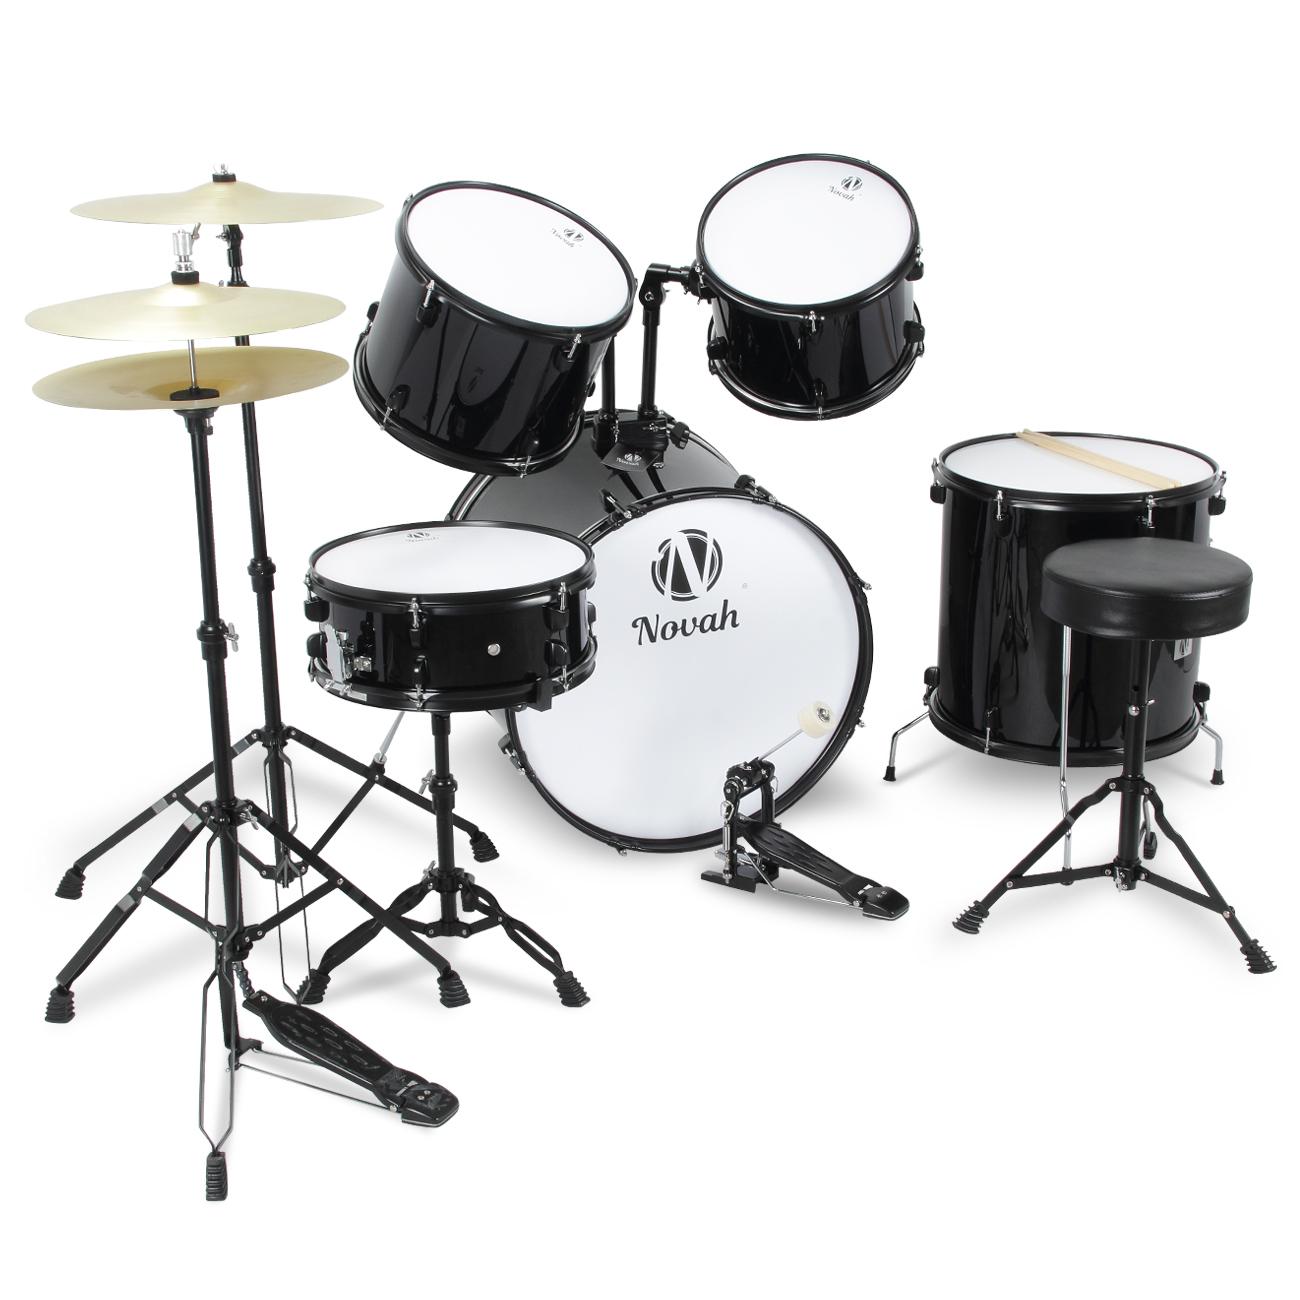 5pc drum set adult complete kit cymbals full size starter w drum set and stand ebay. Black Bedroom Furniture Sets. Home Design Ideas